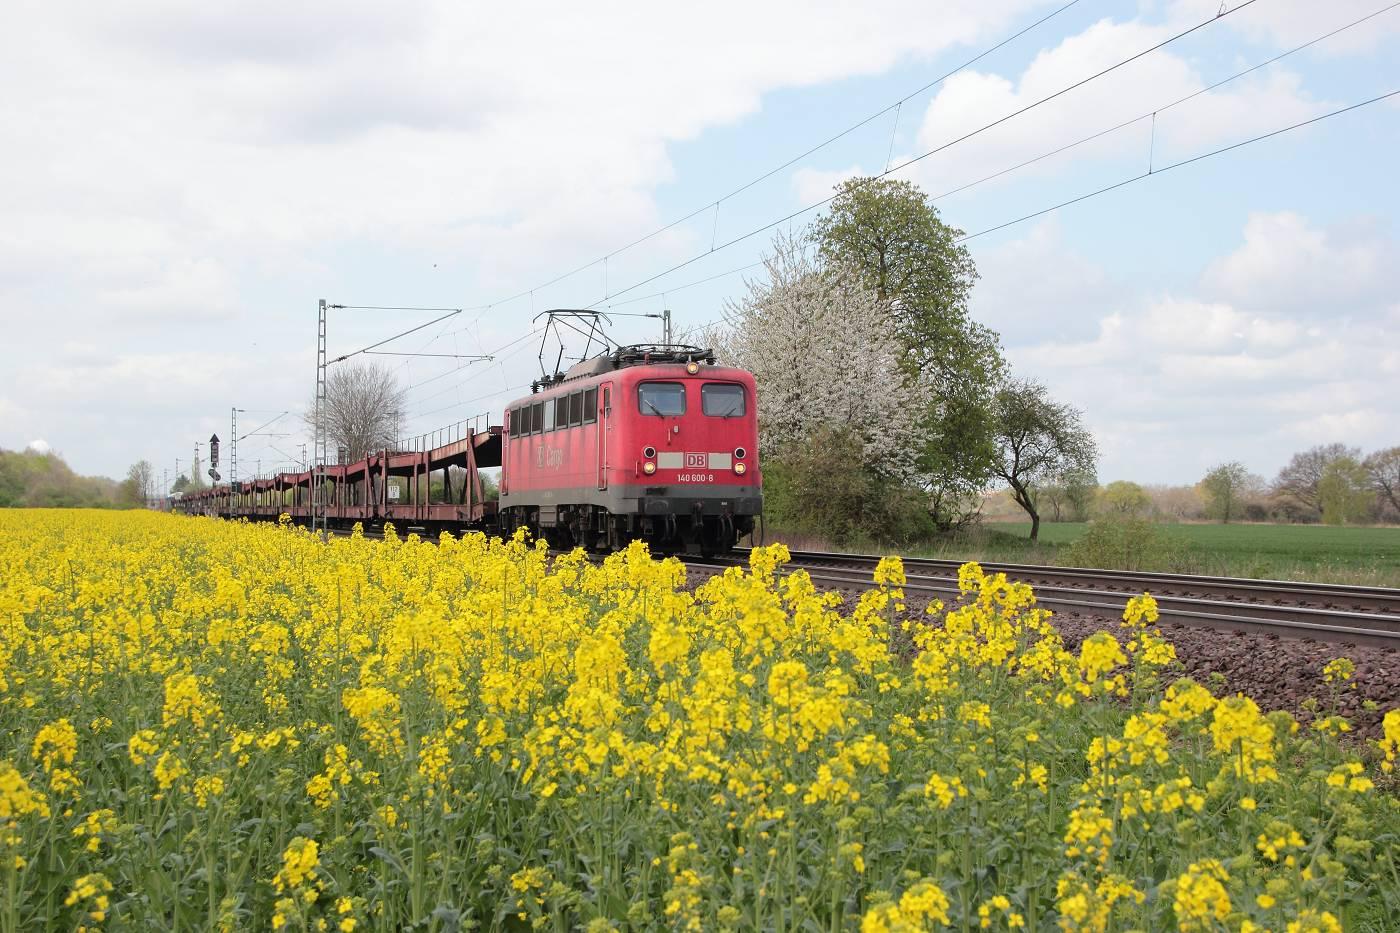 http://www.nachtbahner.de/fotos/2014-04-11%20Hochbetrieb%20in%20HB-Mahndorf/k-IMG_2793%20Mahndorfer%20Raps%20%286%29.JPG